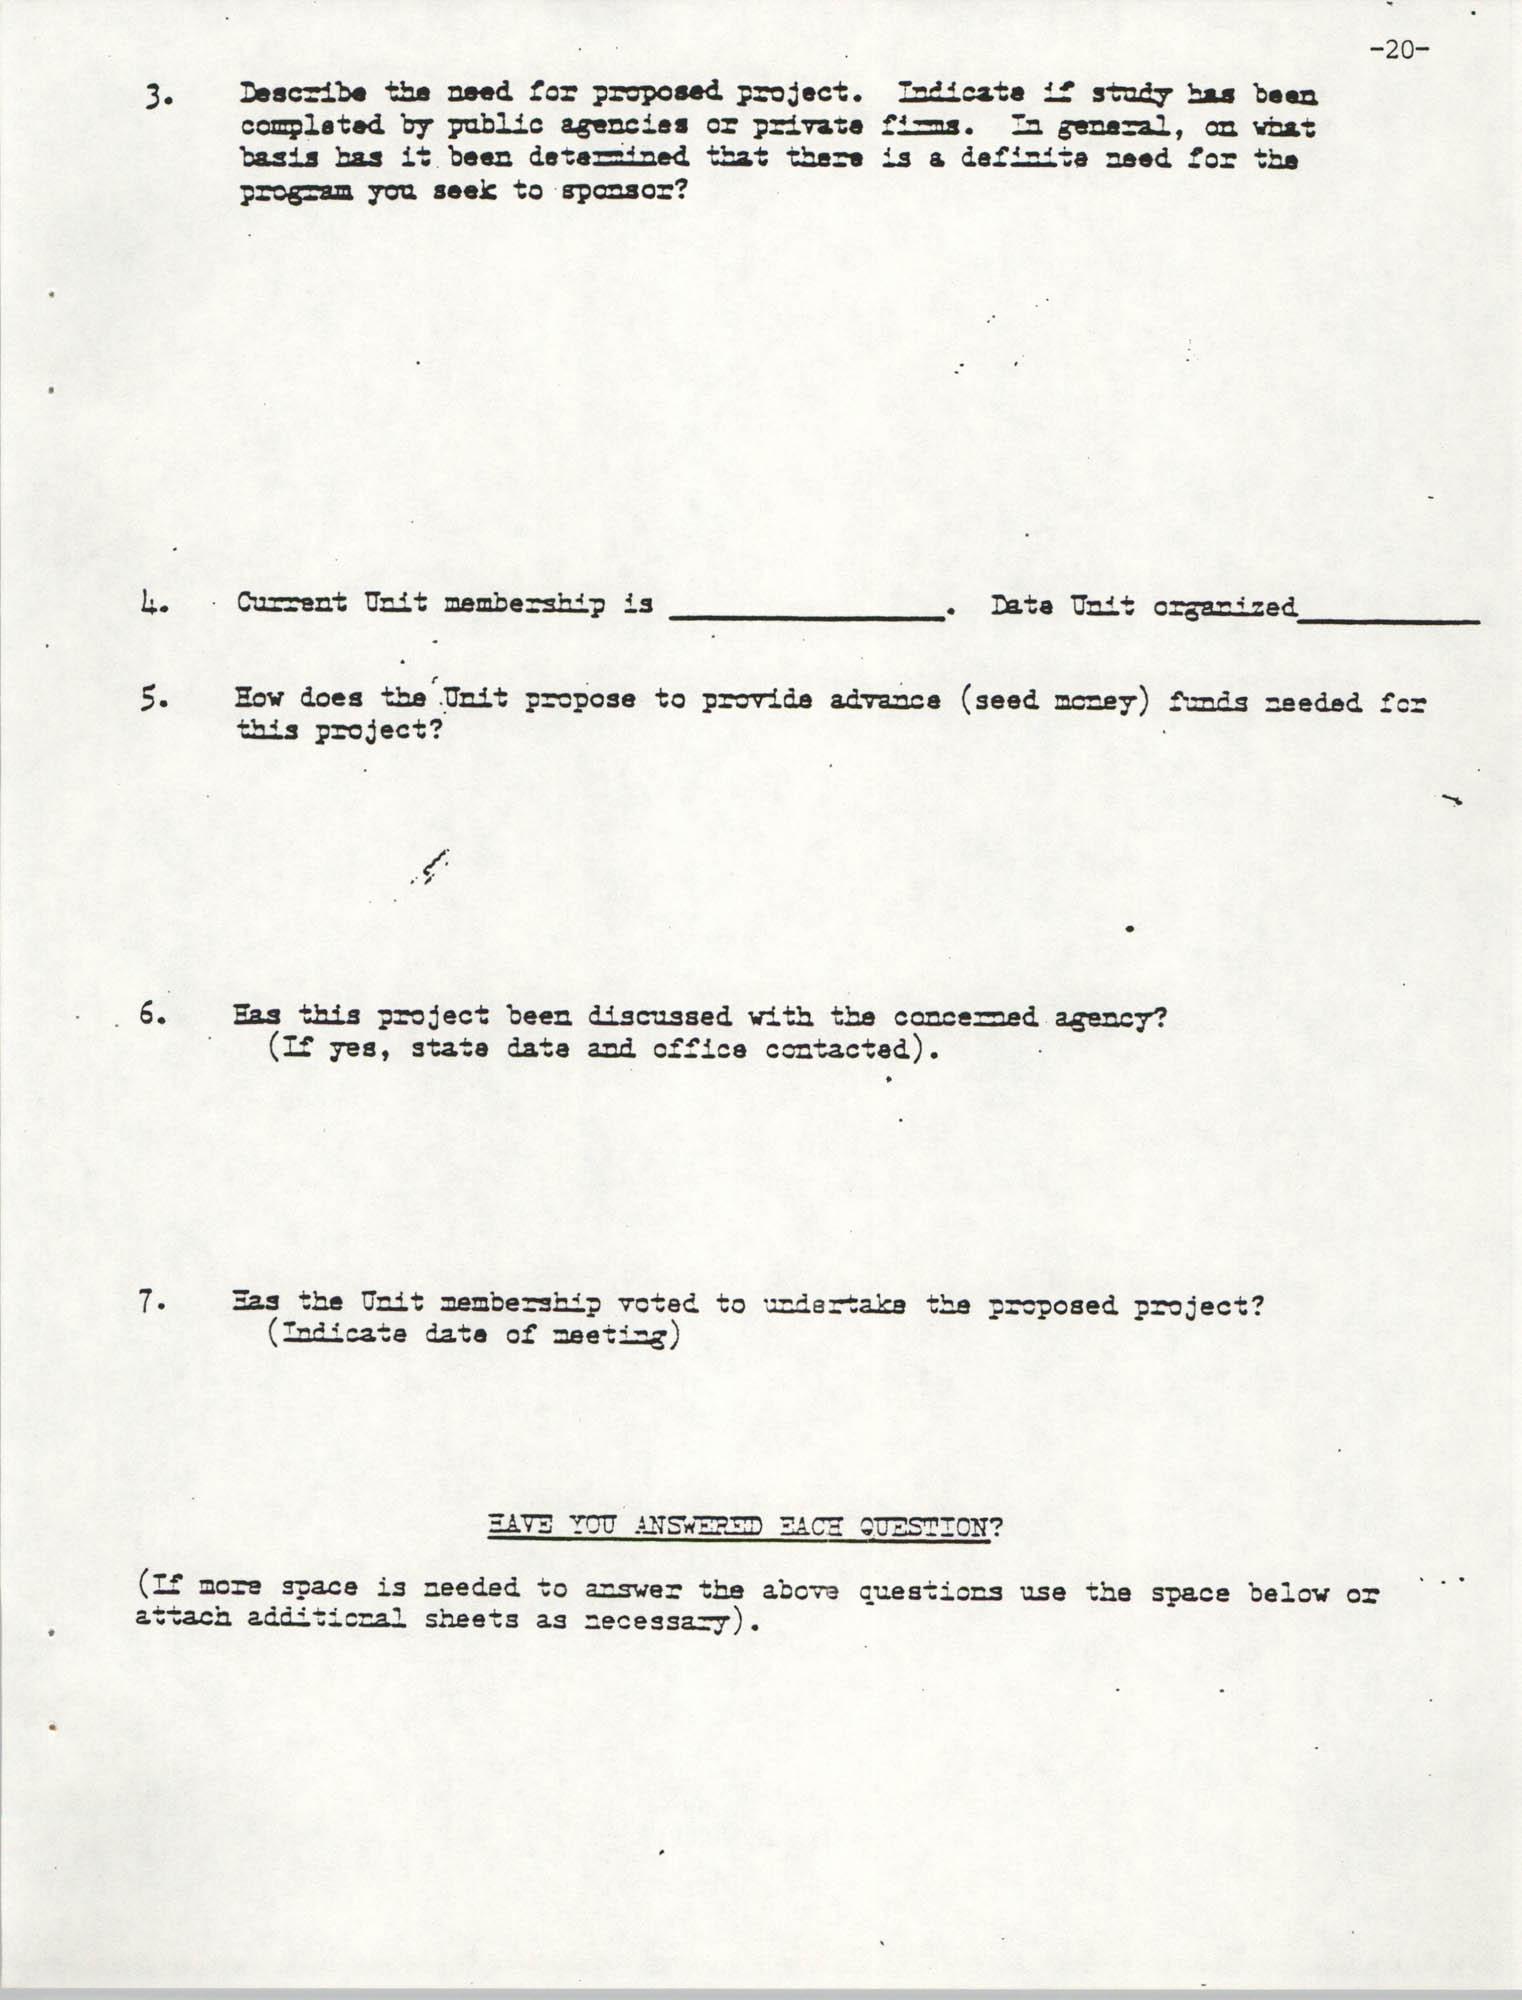 NAACP Mandatory Training Handbook, 1989, Page 20